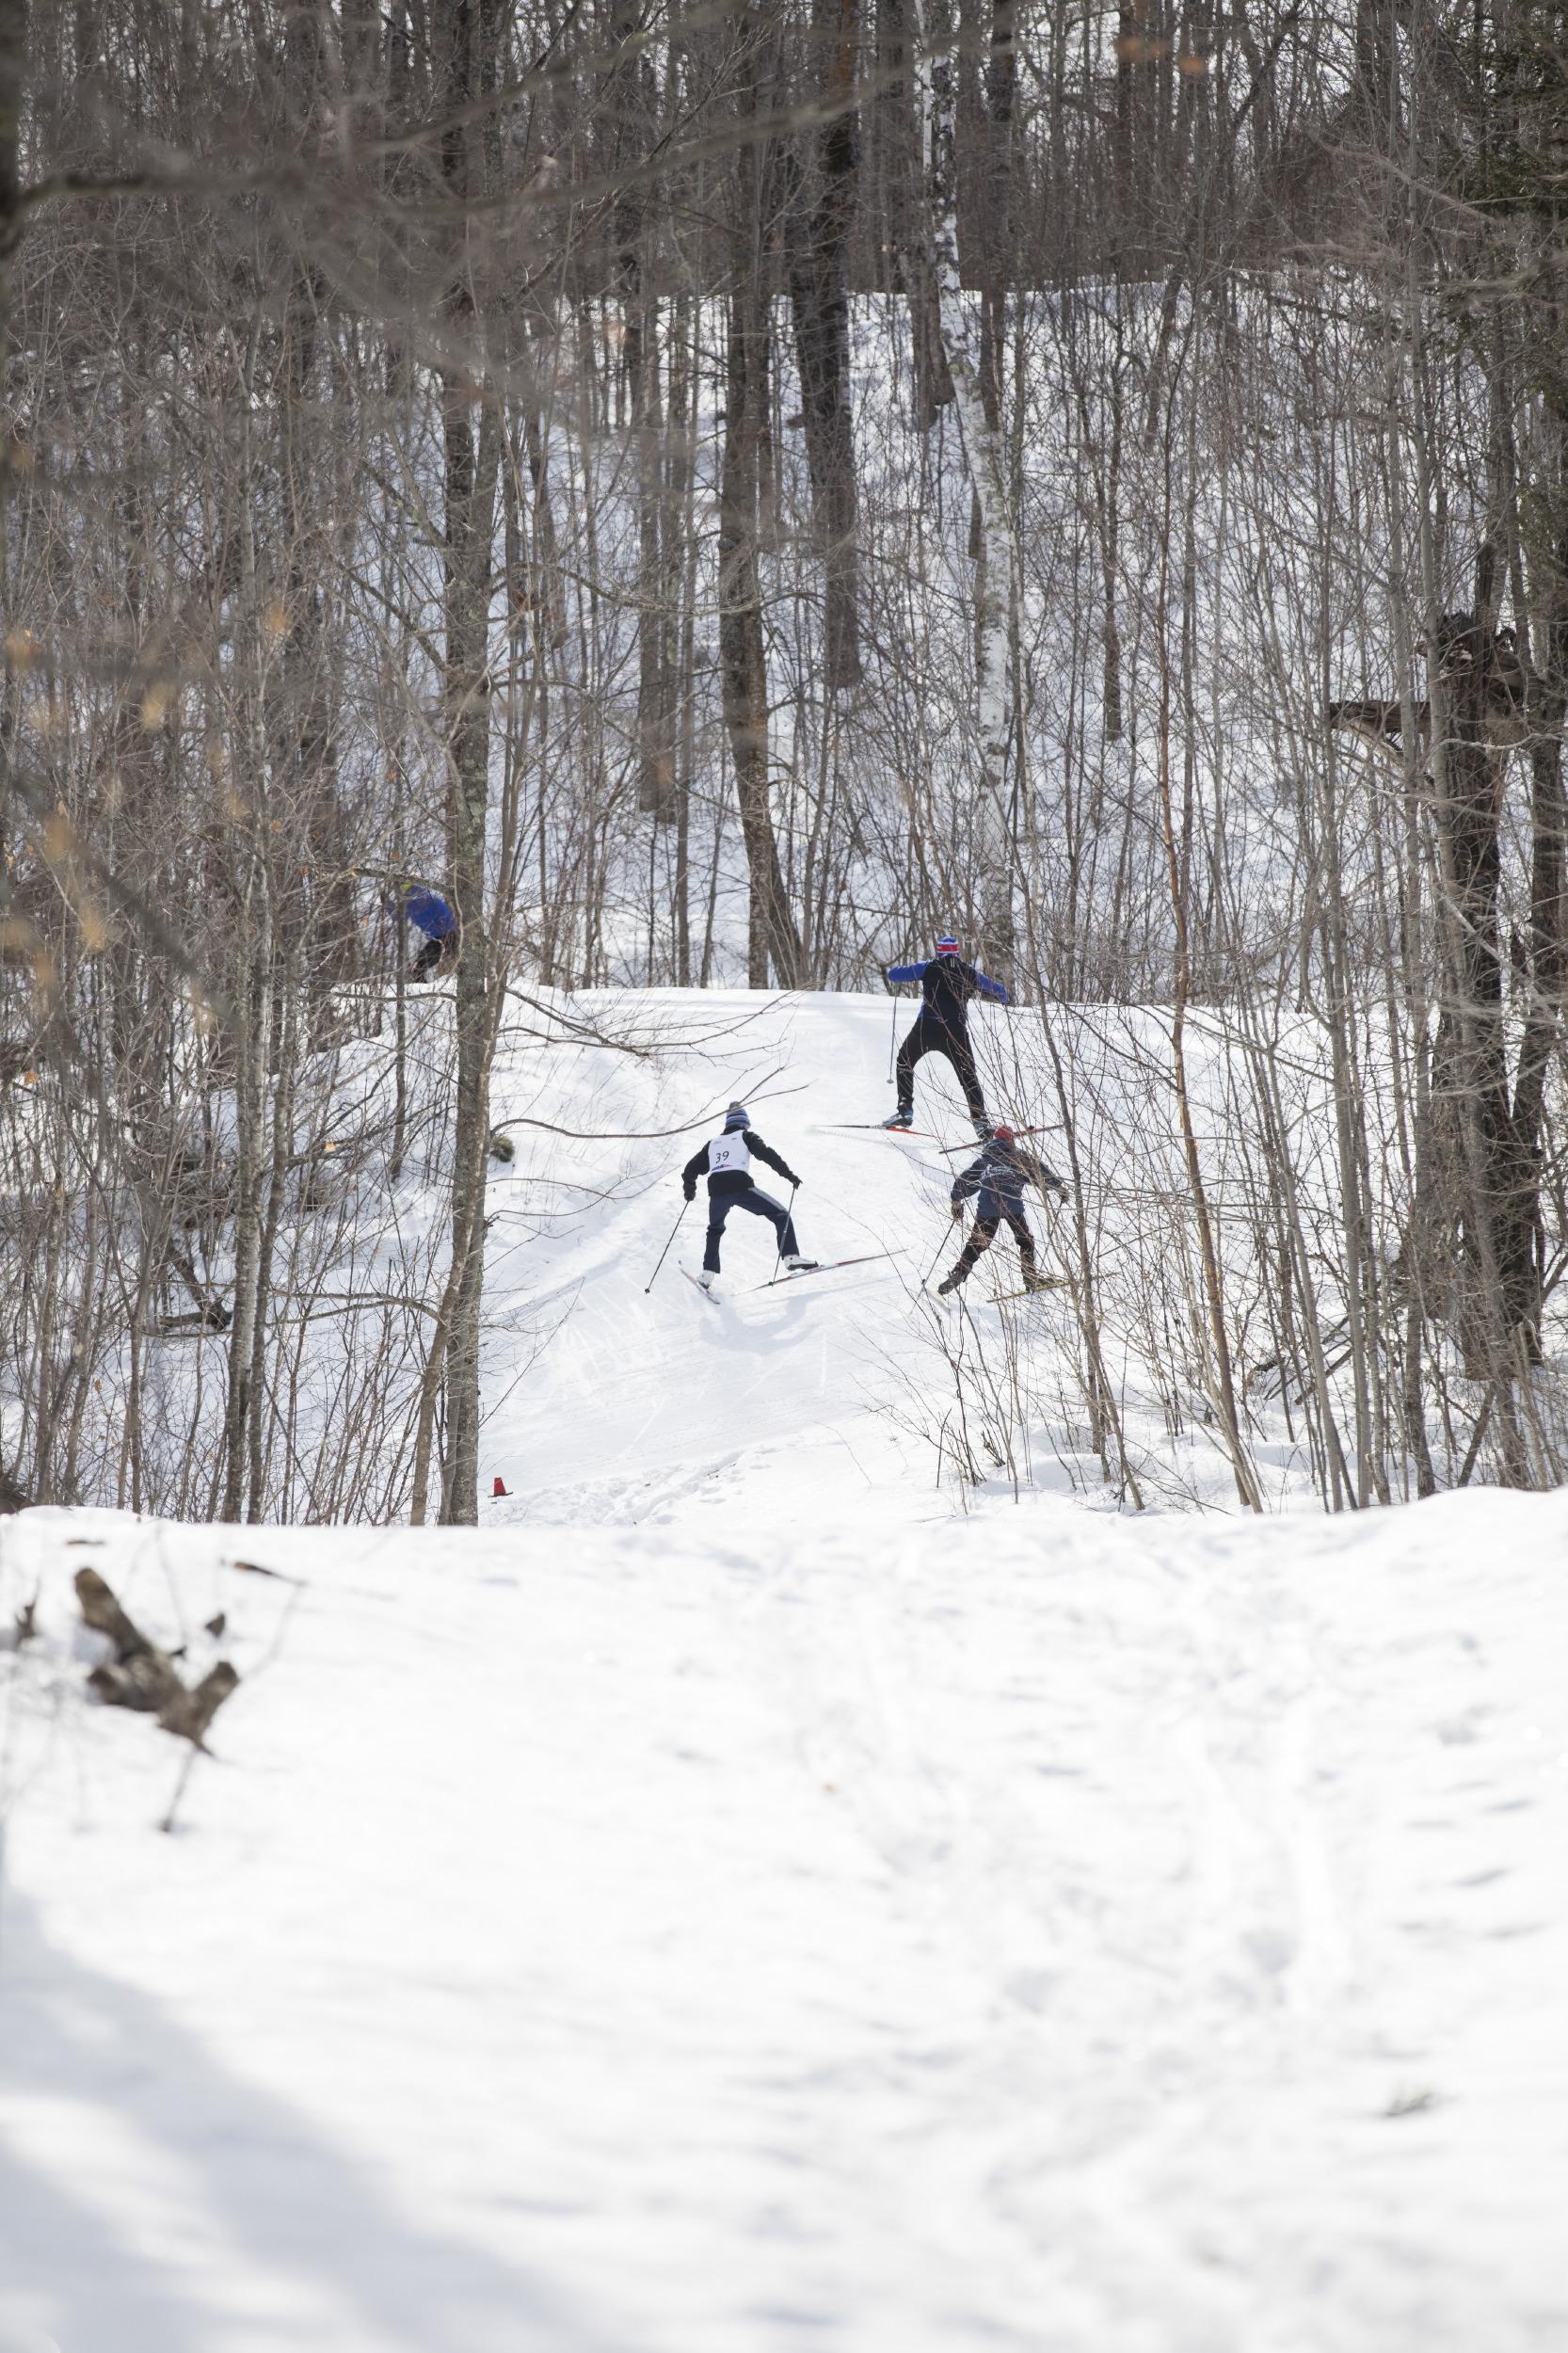 AckermanGruber_Skiing_11.JPG